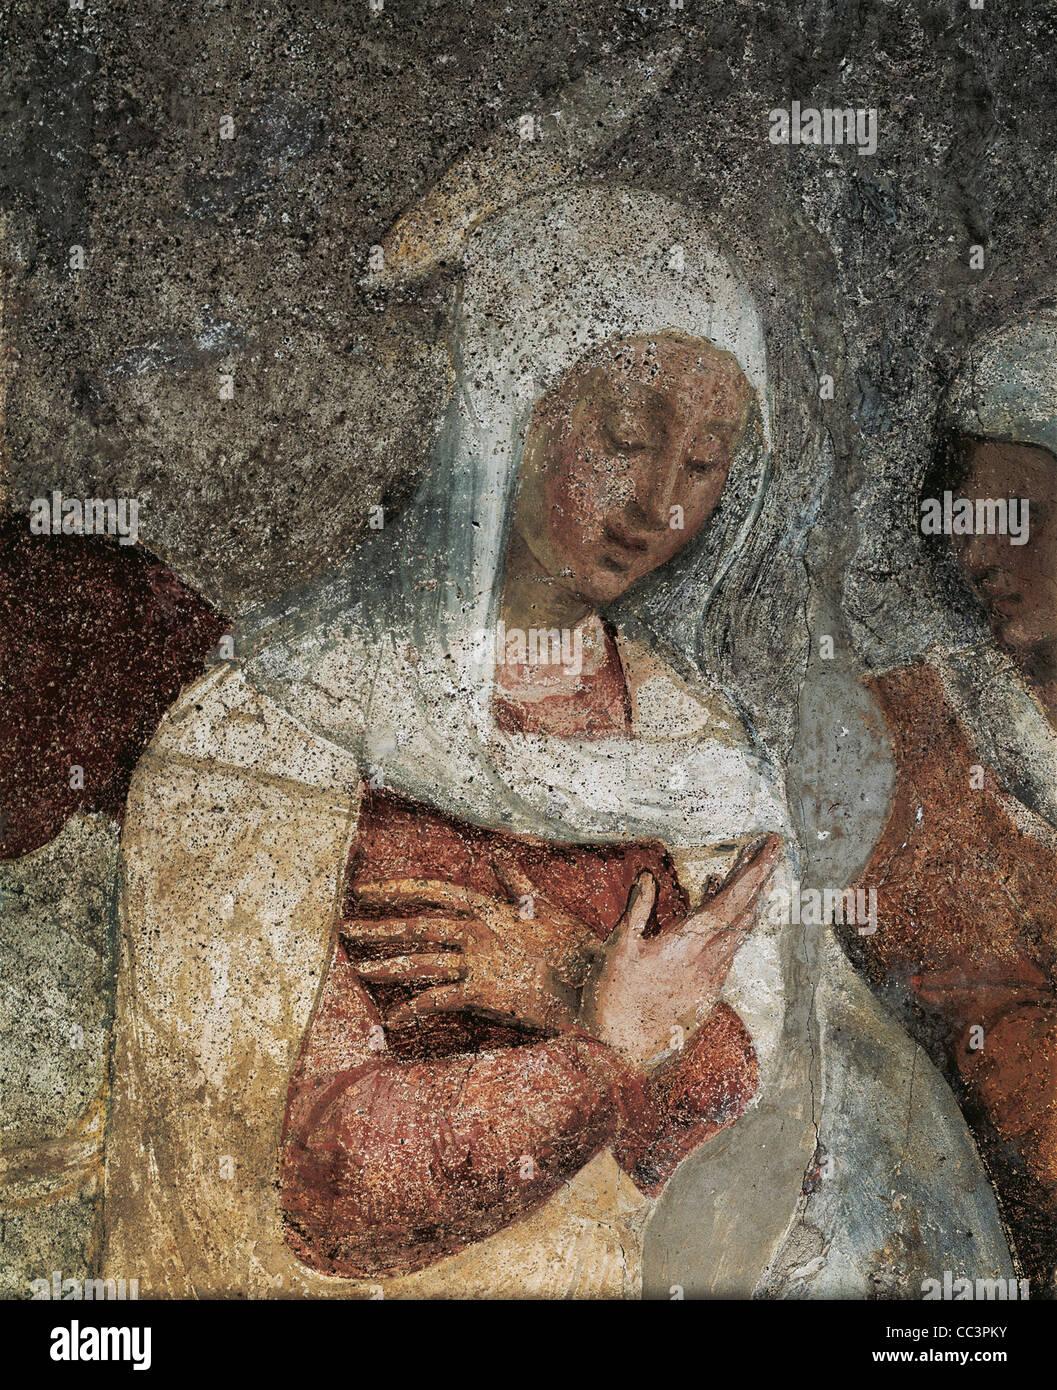 Liguria Chiavari Shrine Of Our Lady Of Grace Teramo Piaggio Fresco Life Of Christ Stock Photo